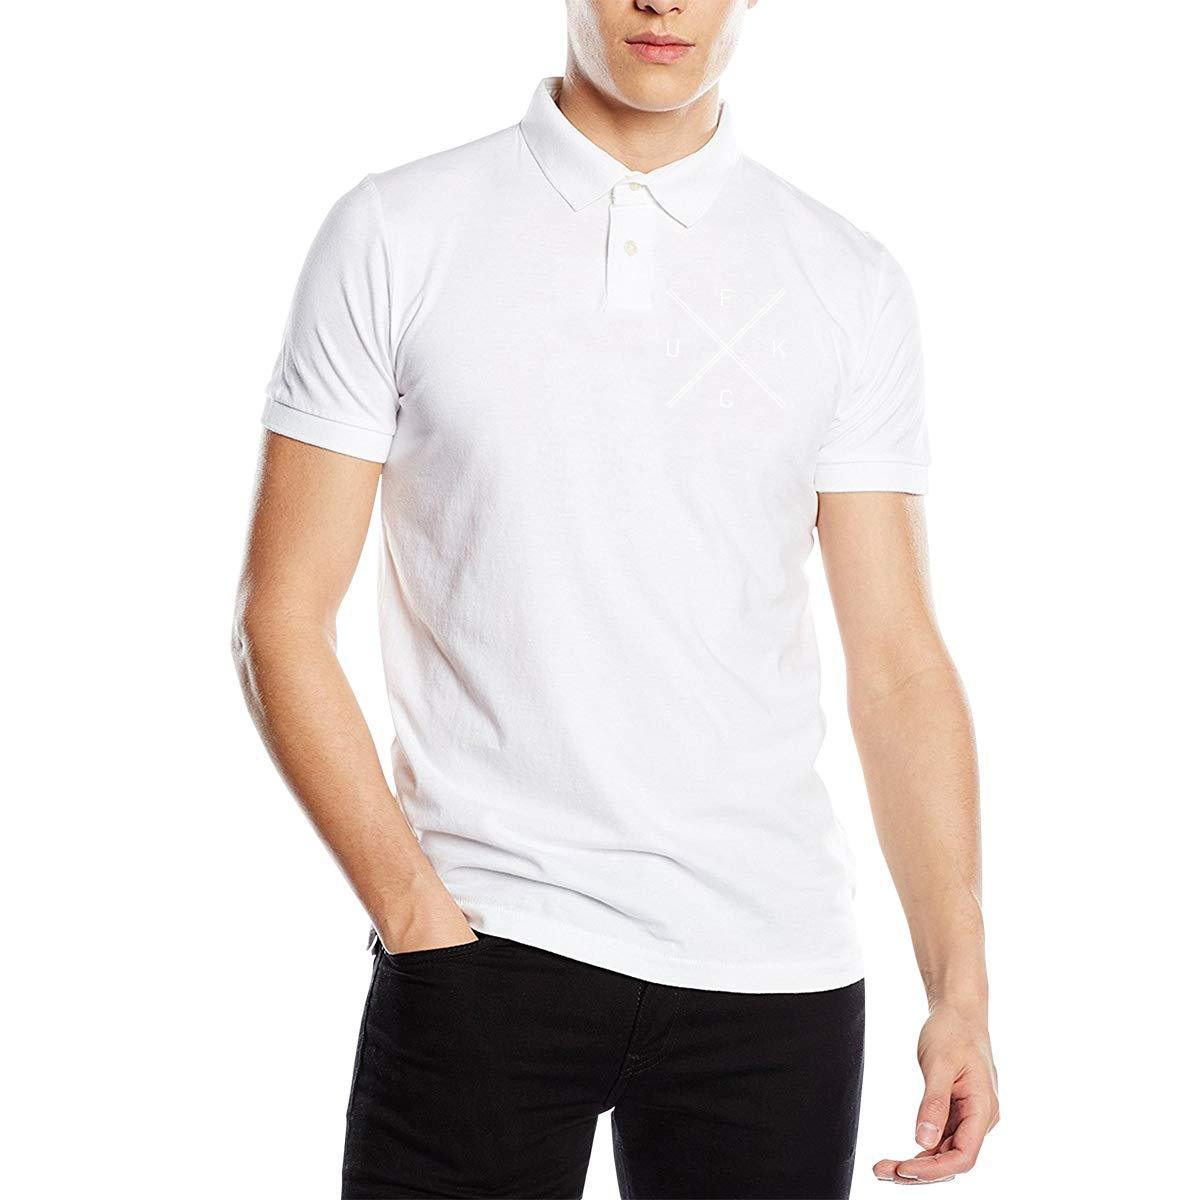 Q64 Fuck Mens Short-Sleeve Polo Shirts